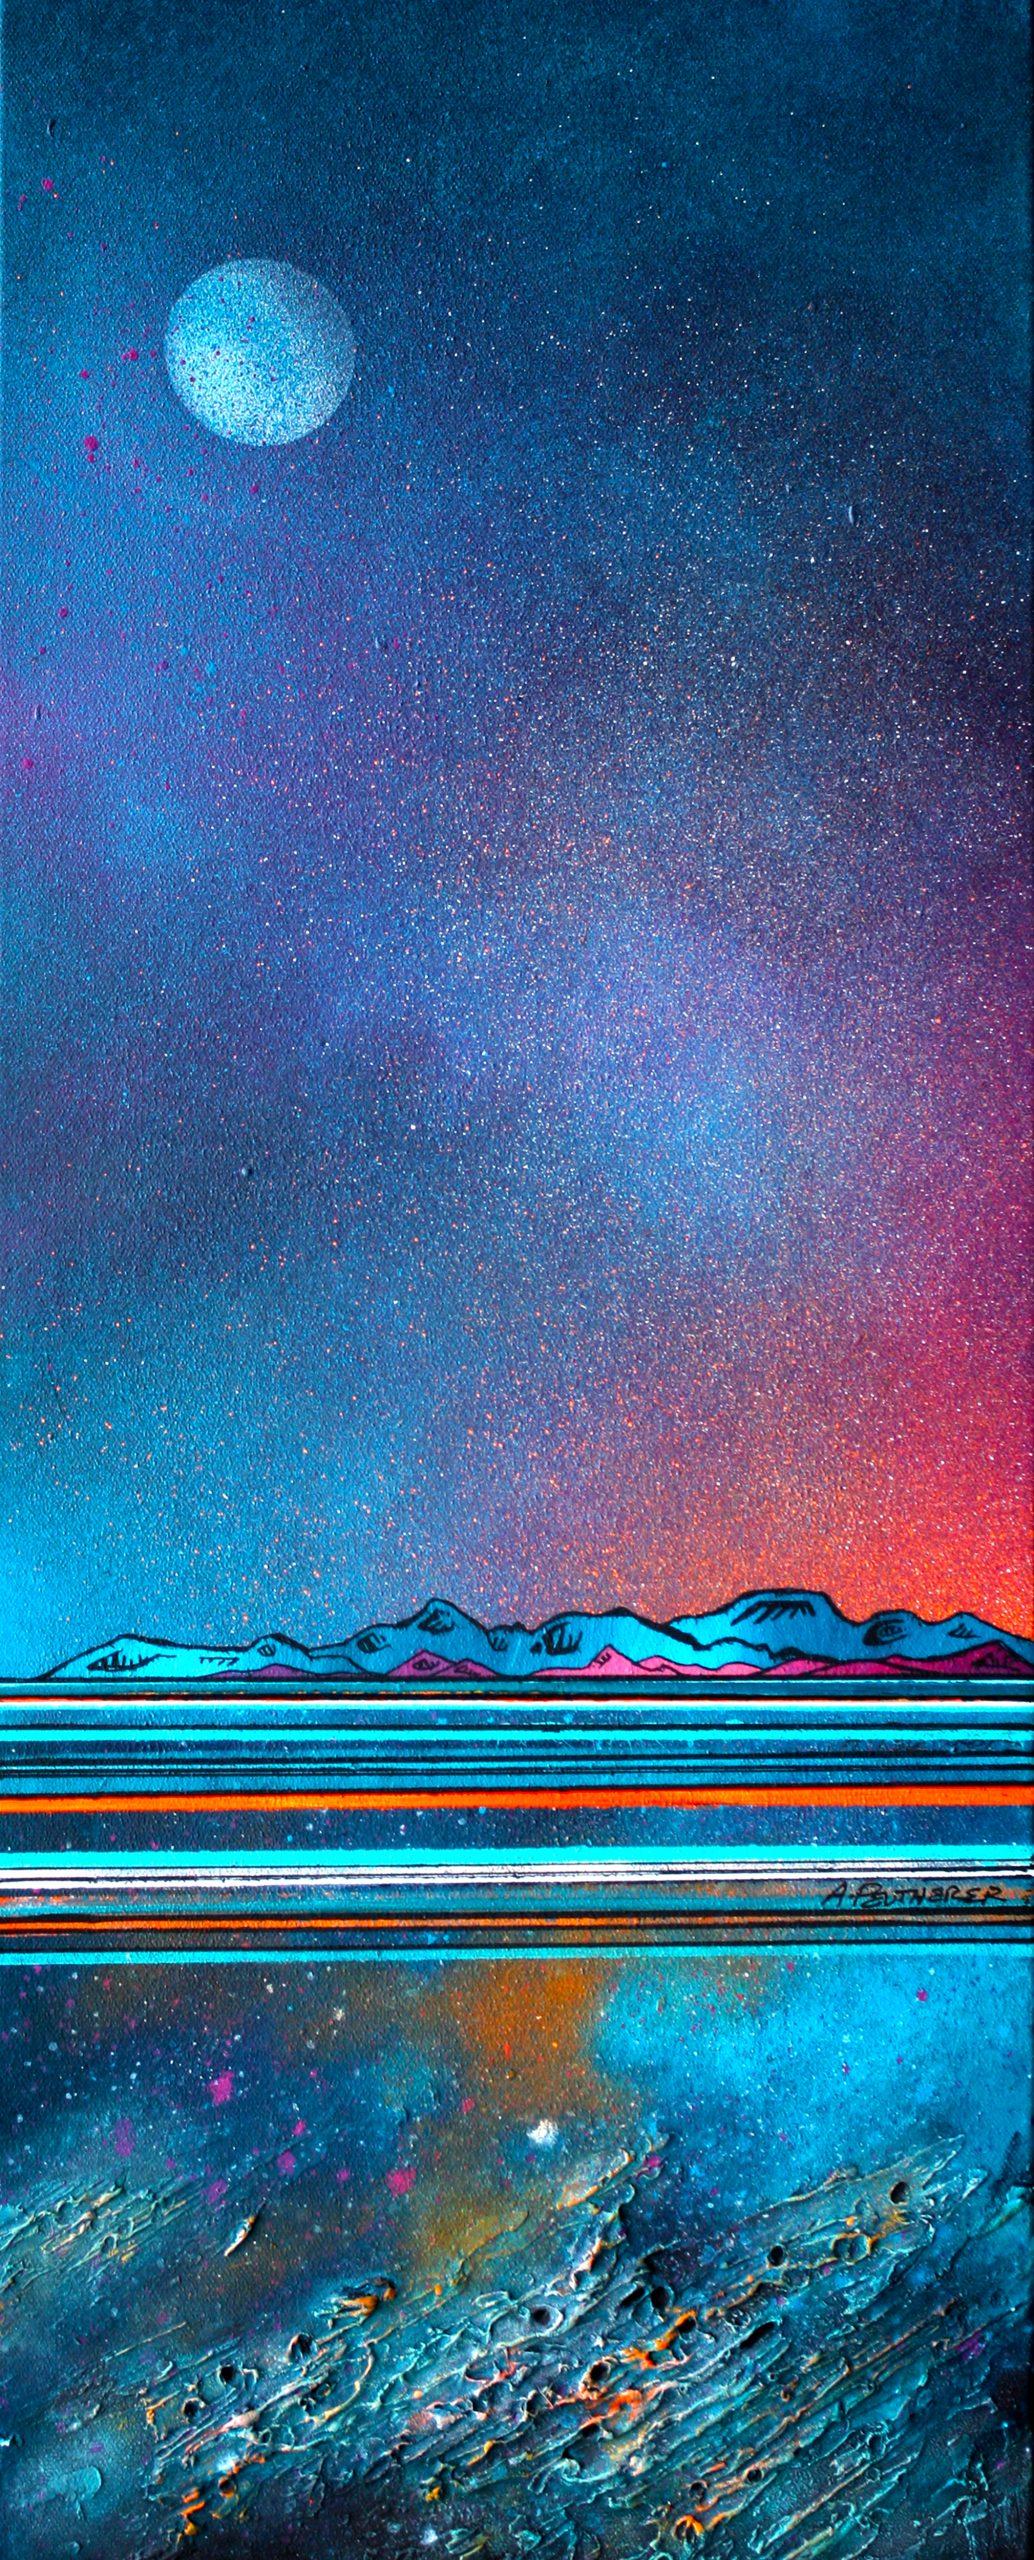 Coral Reef, Skye, Scottish Hebrides - Original canvas painting & art prints